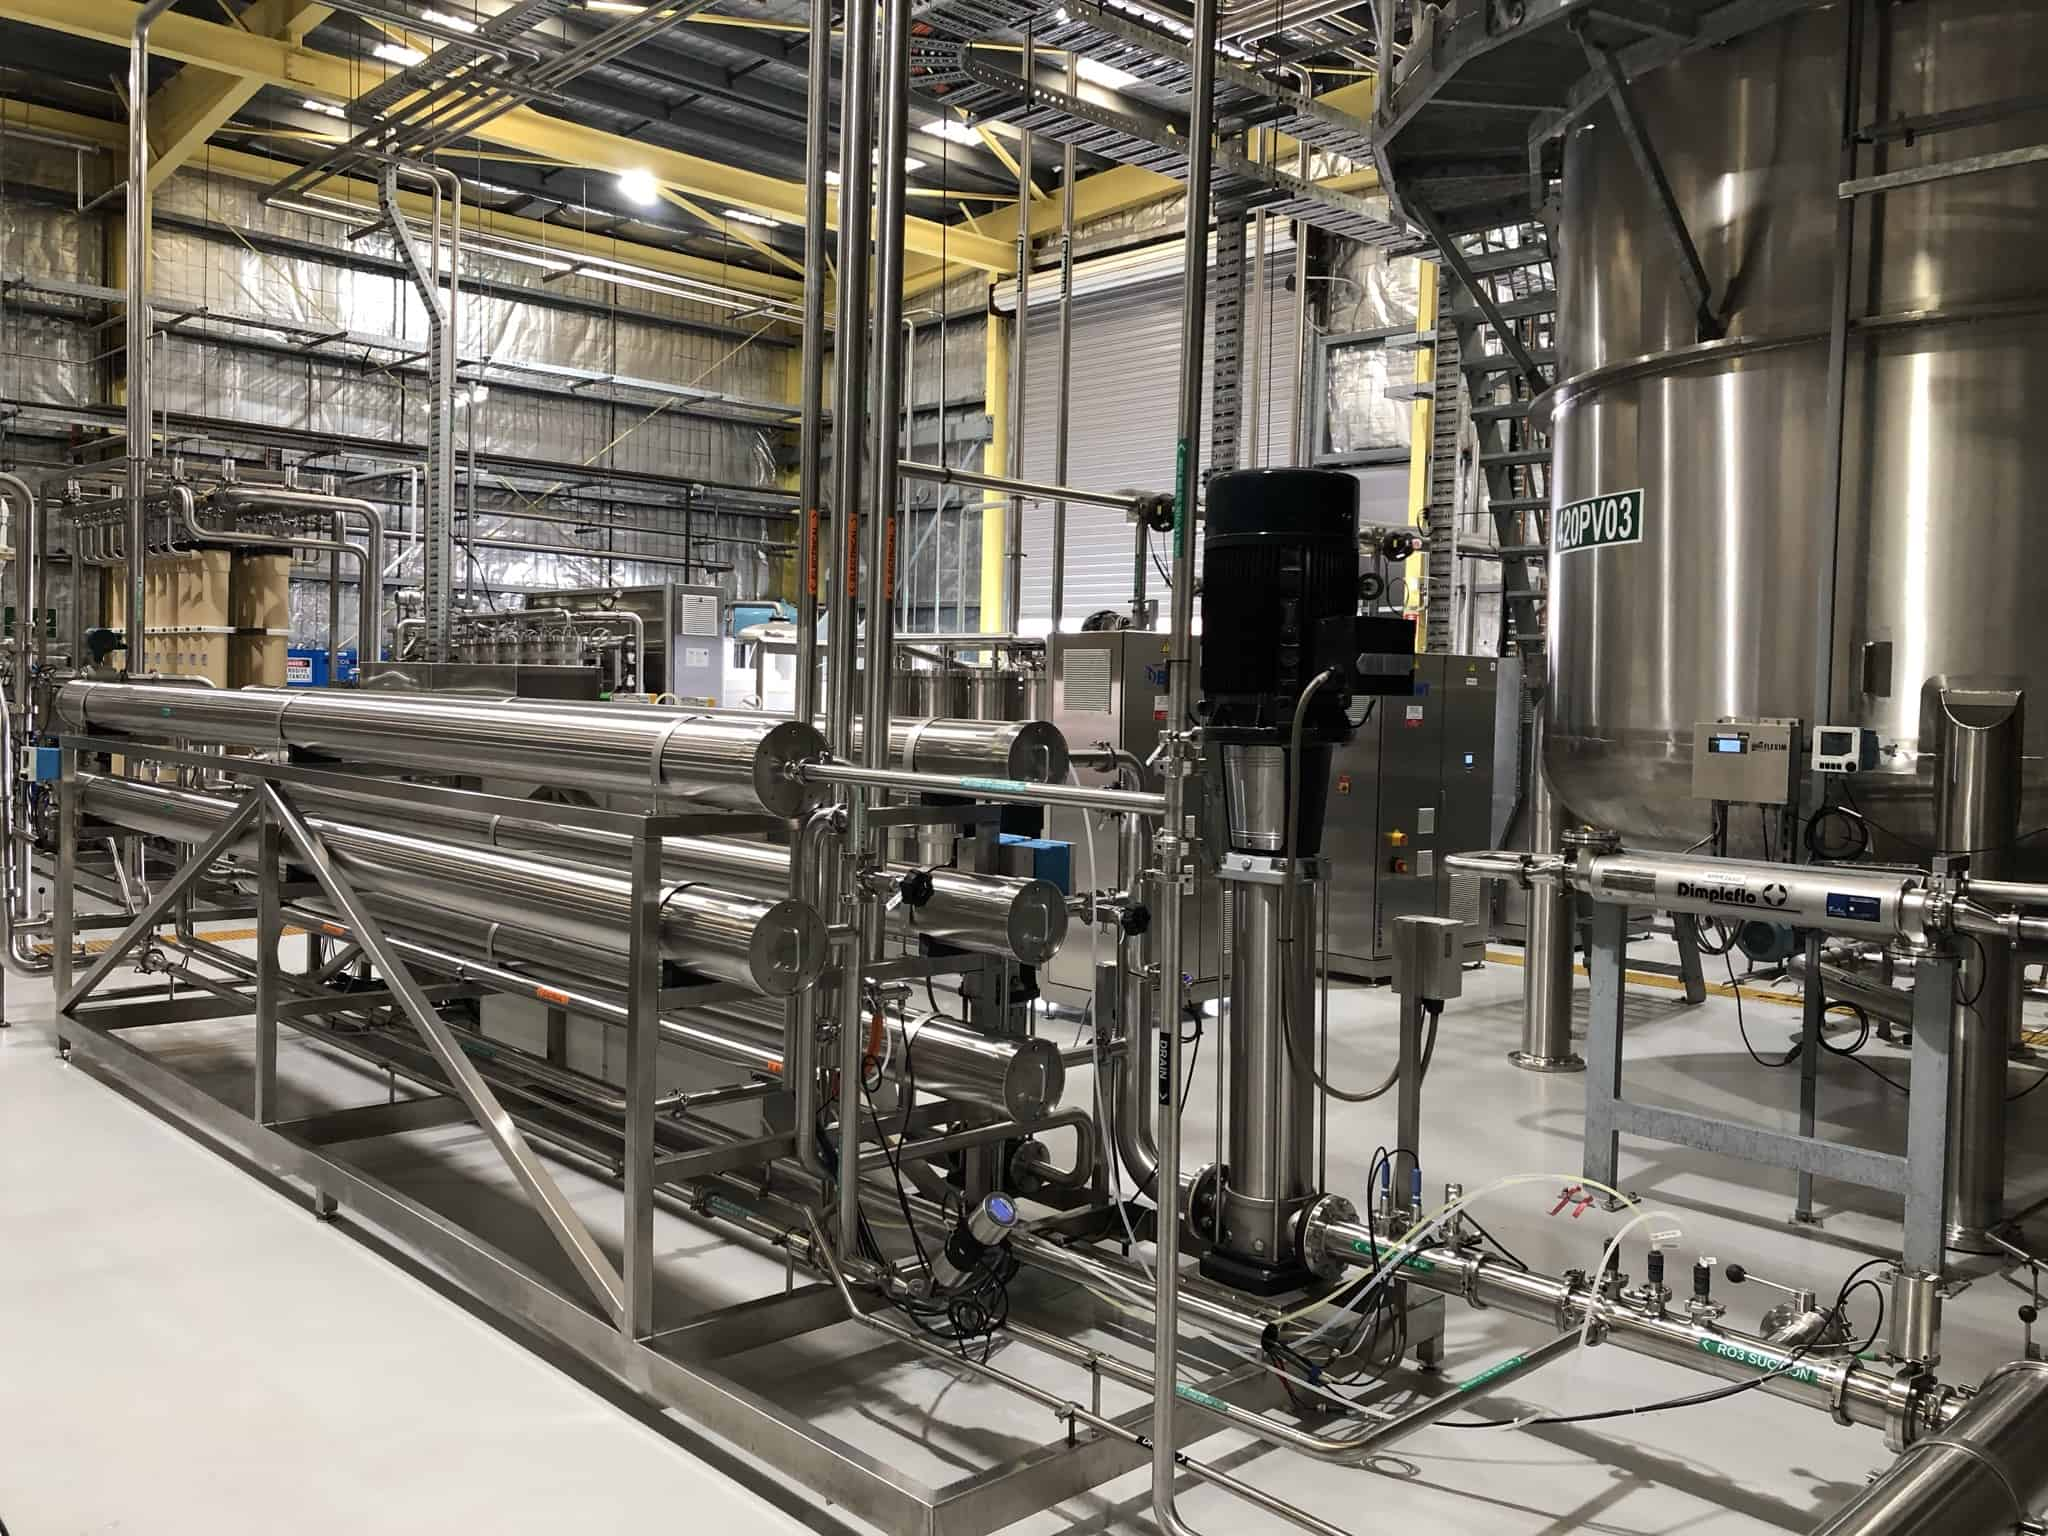 Purified Water Systems Pharma & Biotech 2